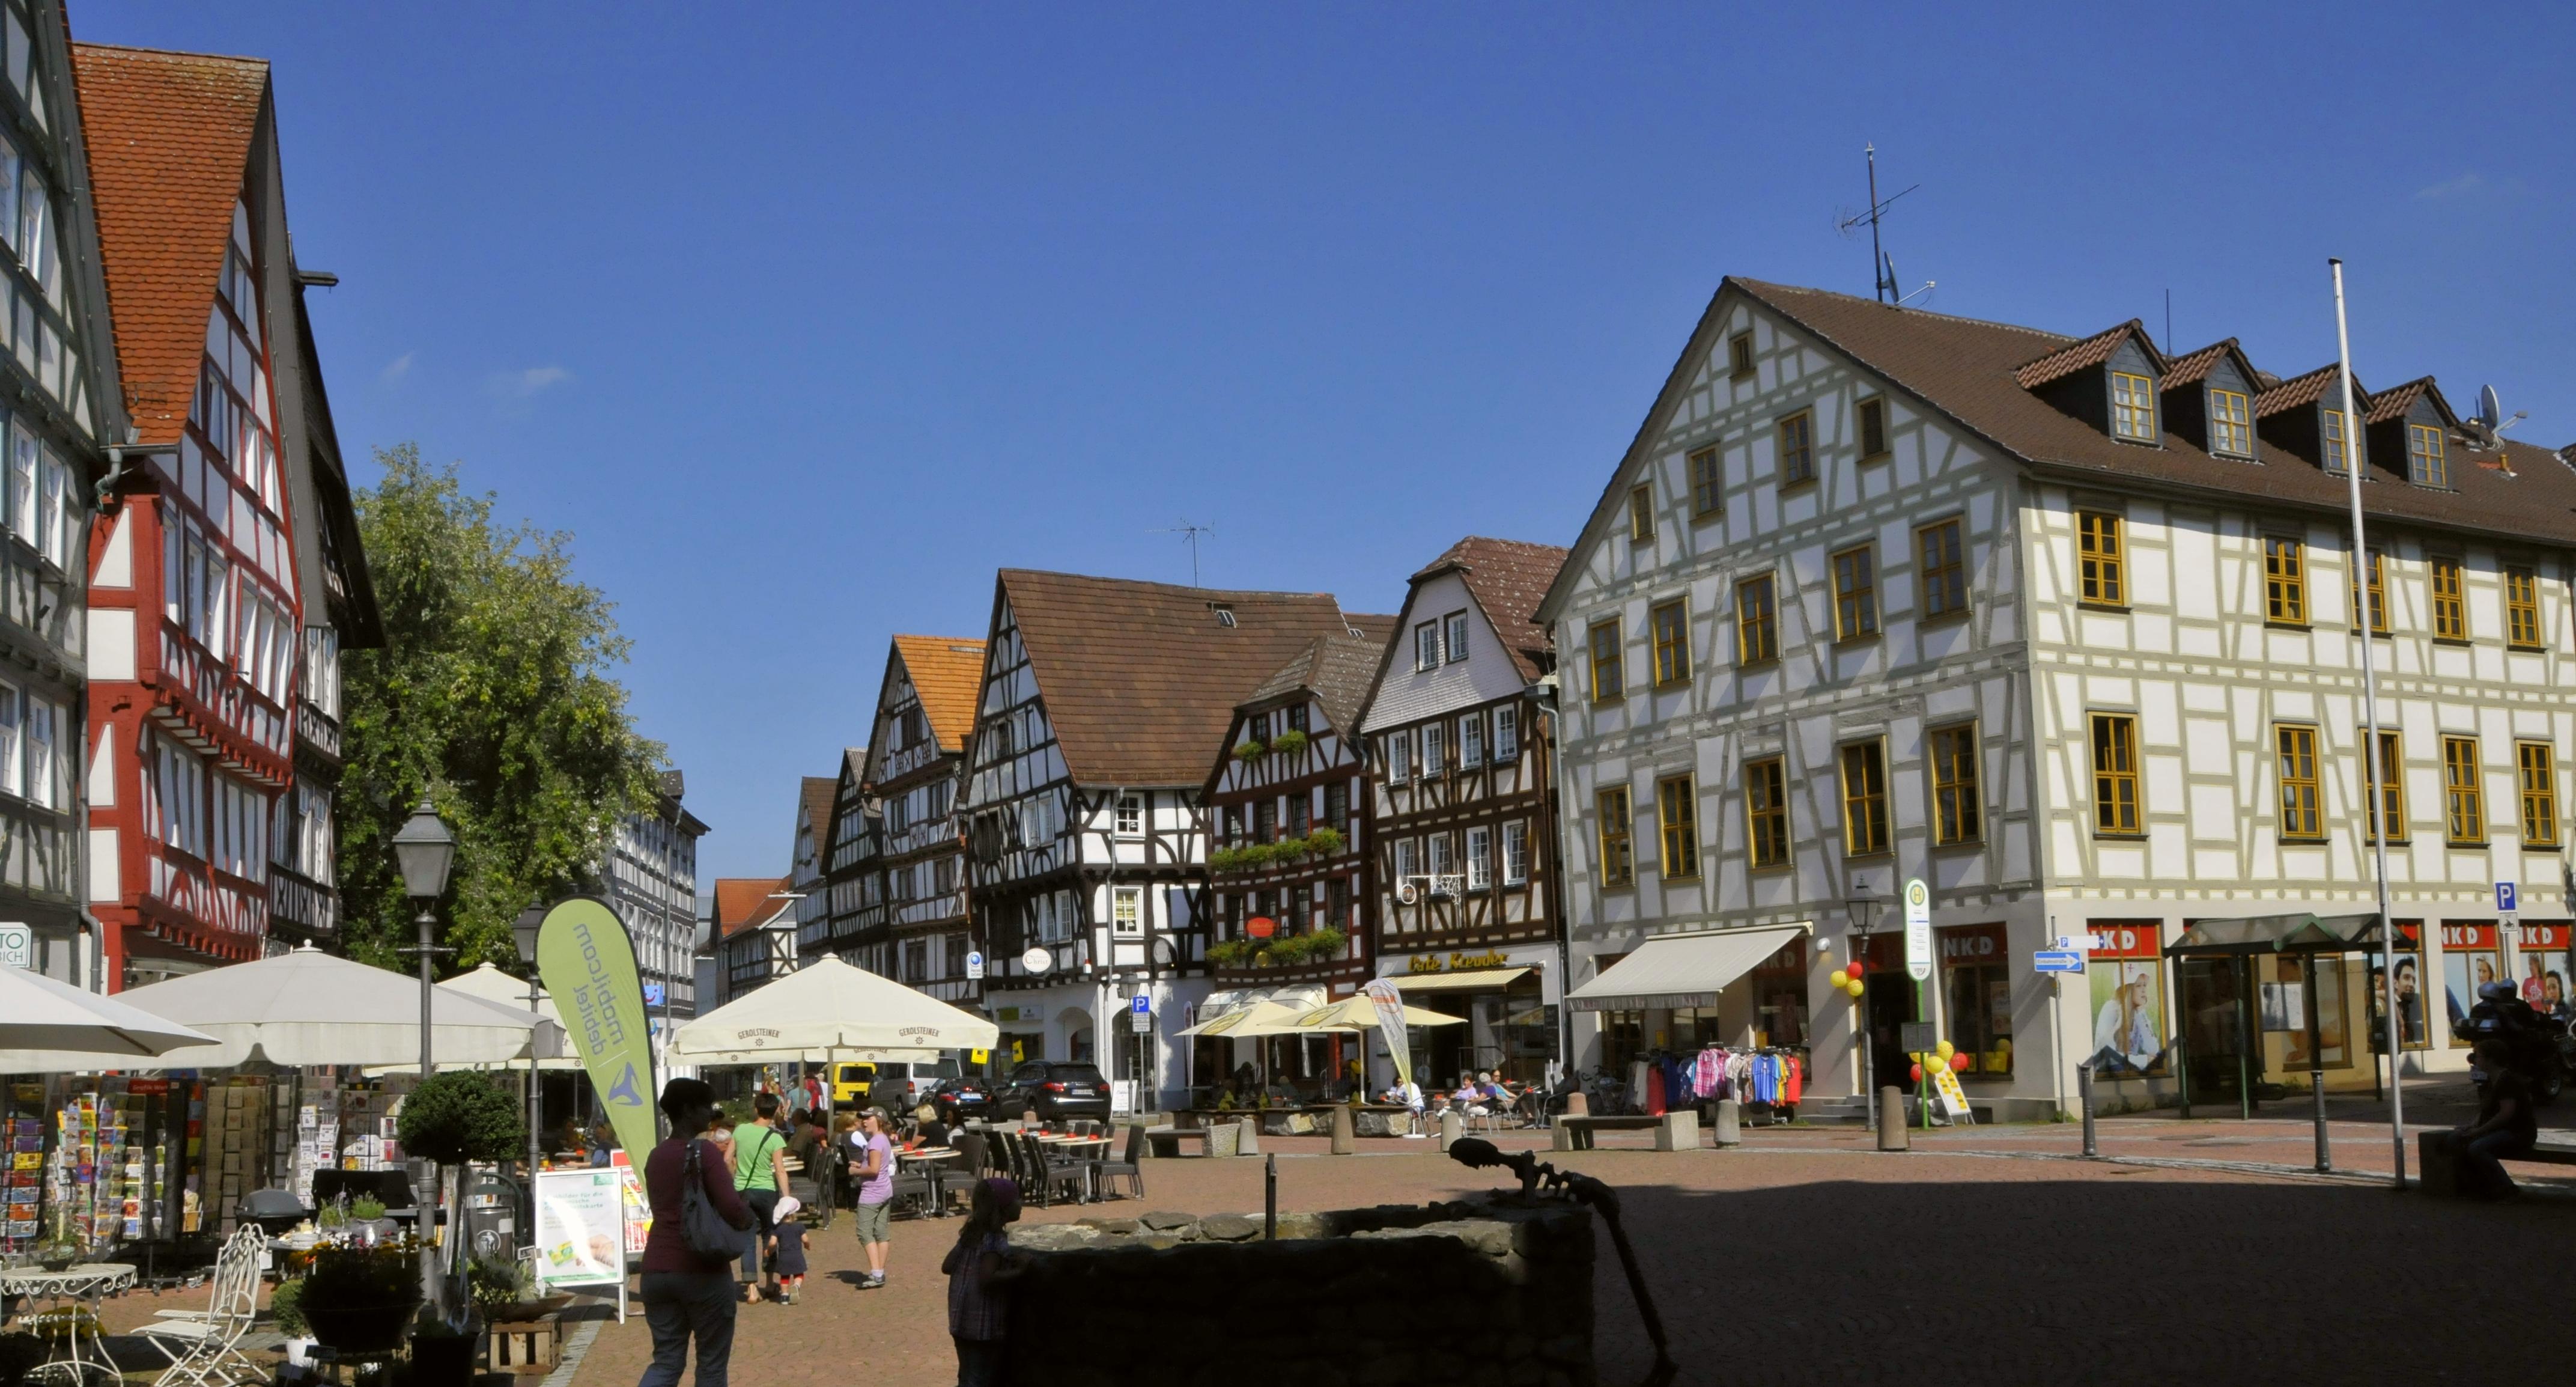 Datei:Grünberg-Marktplatz.JPG – Wikipedia